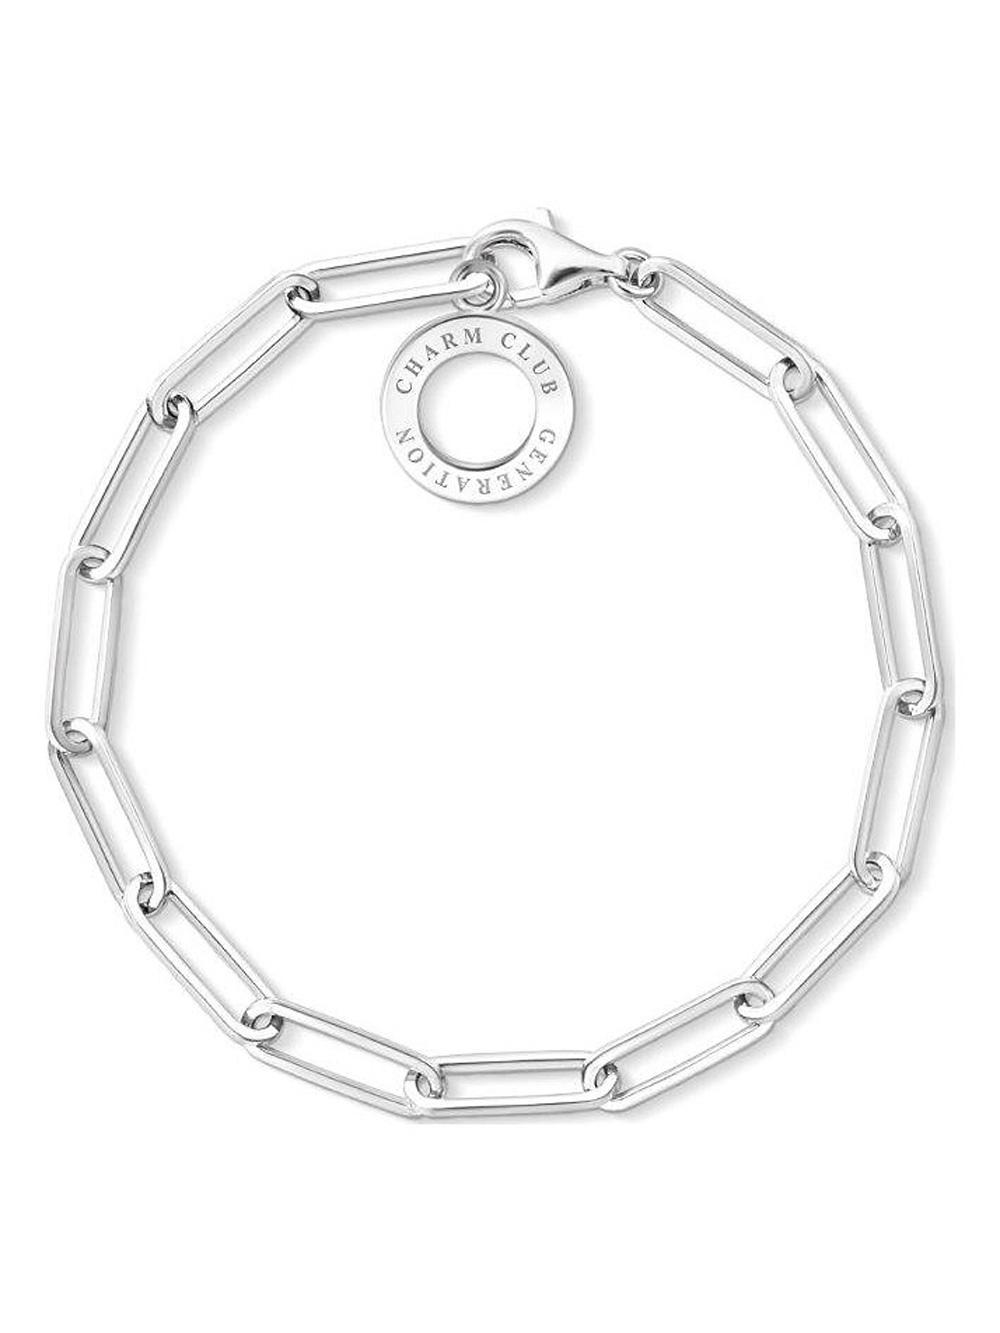 Thomas Sabo Armband Charm-Armband X0259-001-21 19cm | Schmuck > Armbänder > Charm-Armbänder | Thomas Sabo